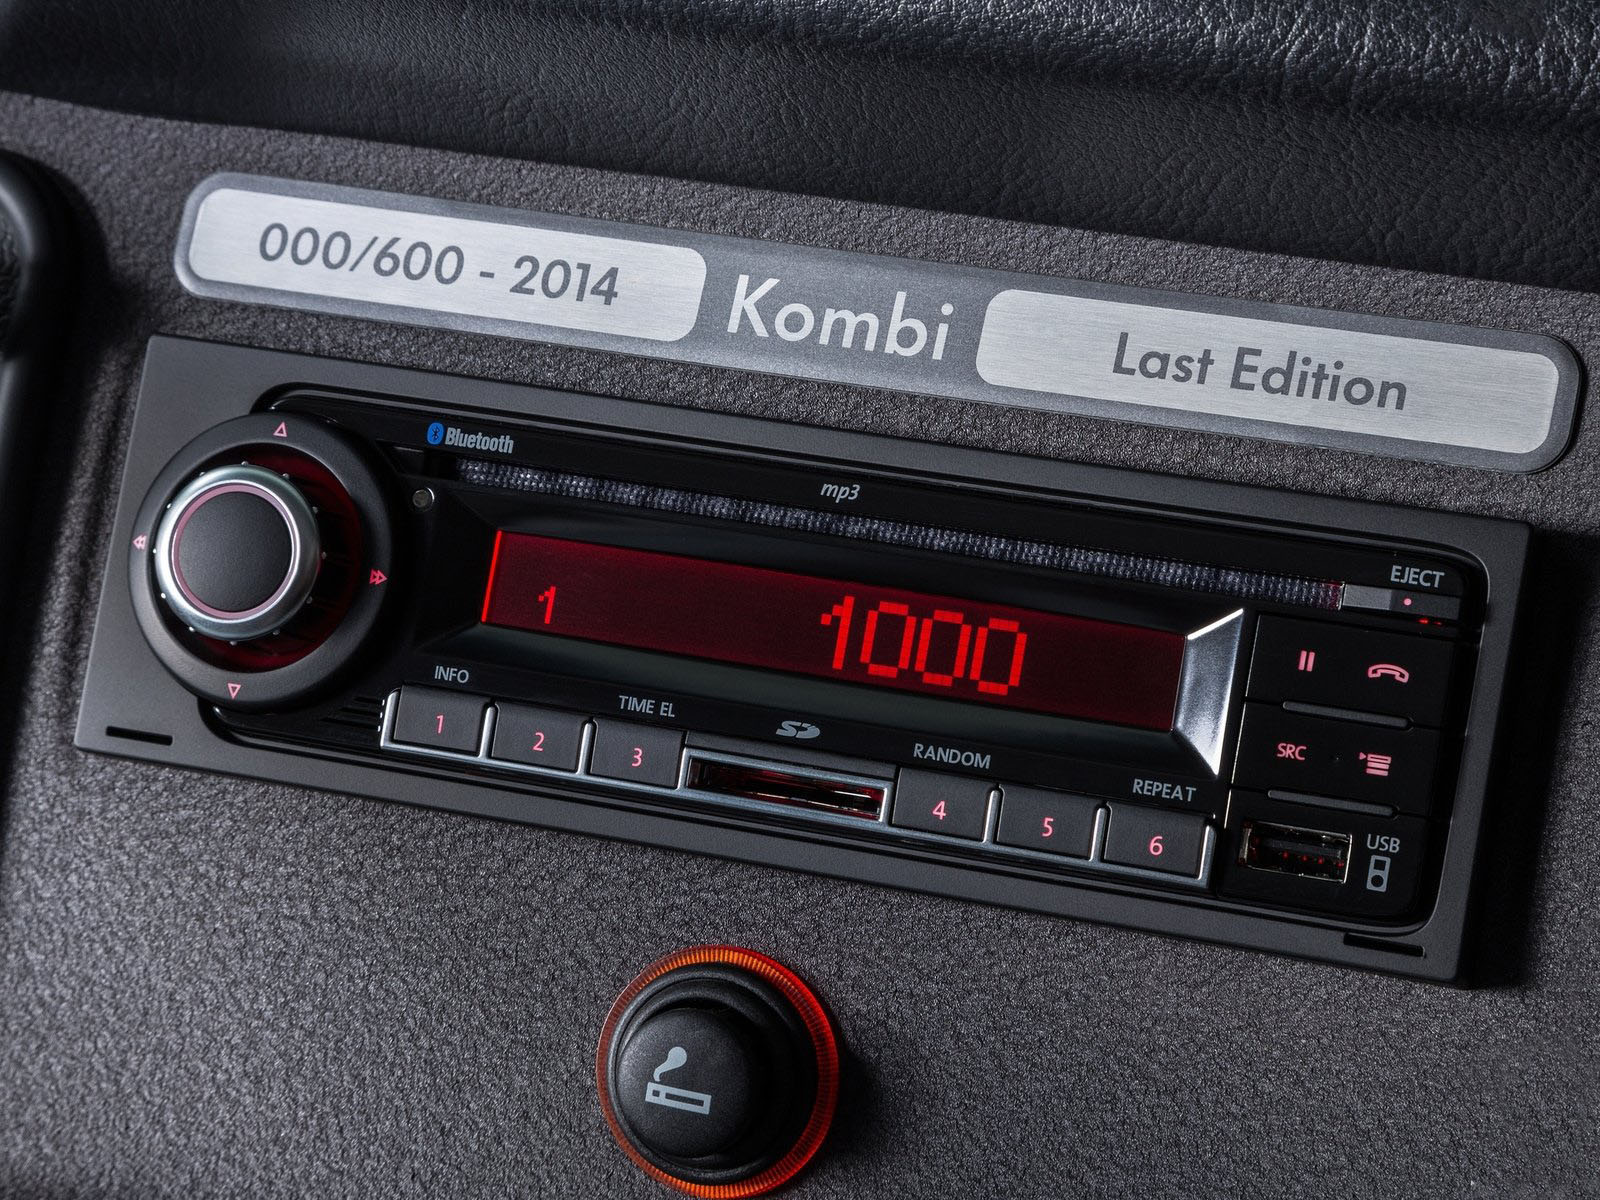 novo Volkswagen Kombi edição especial 2014 radio